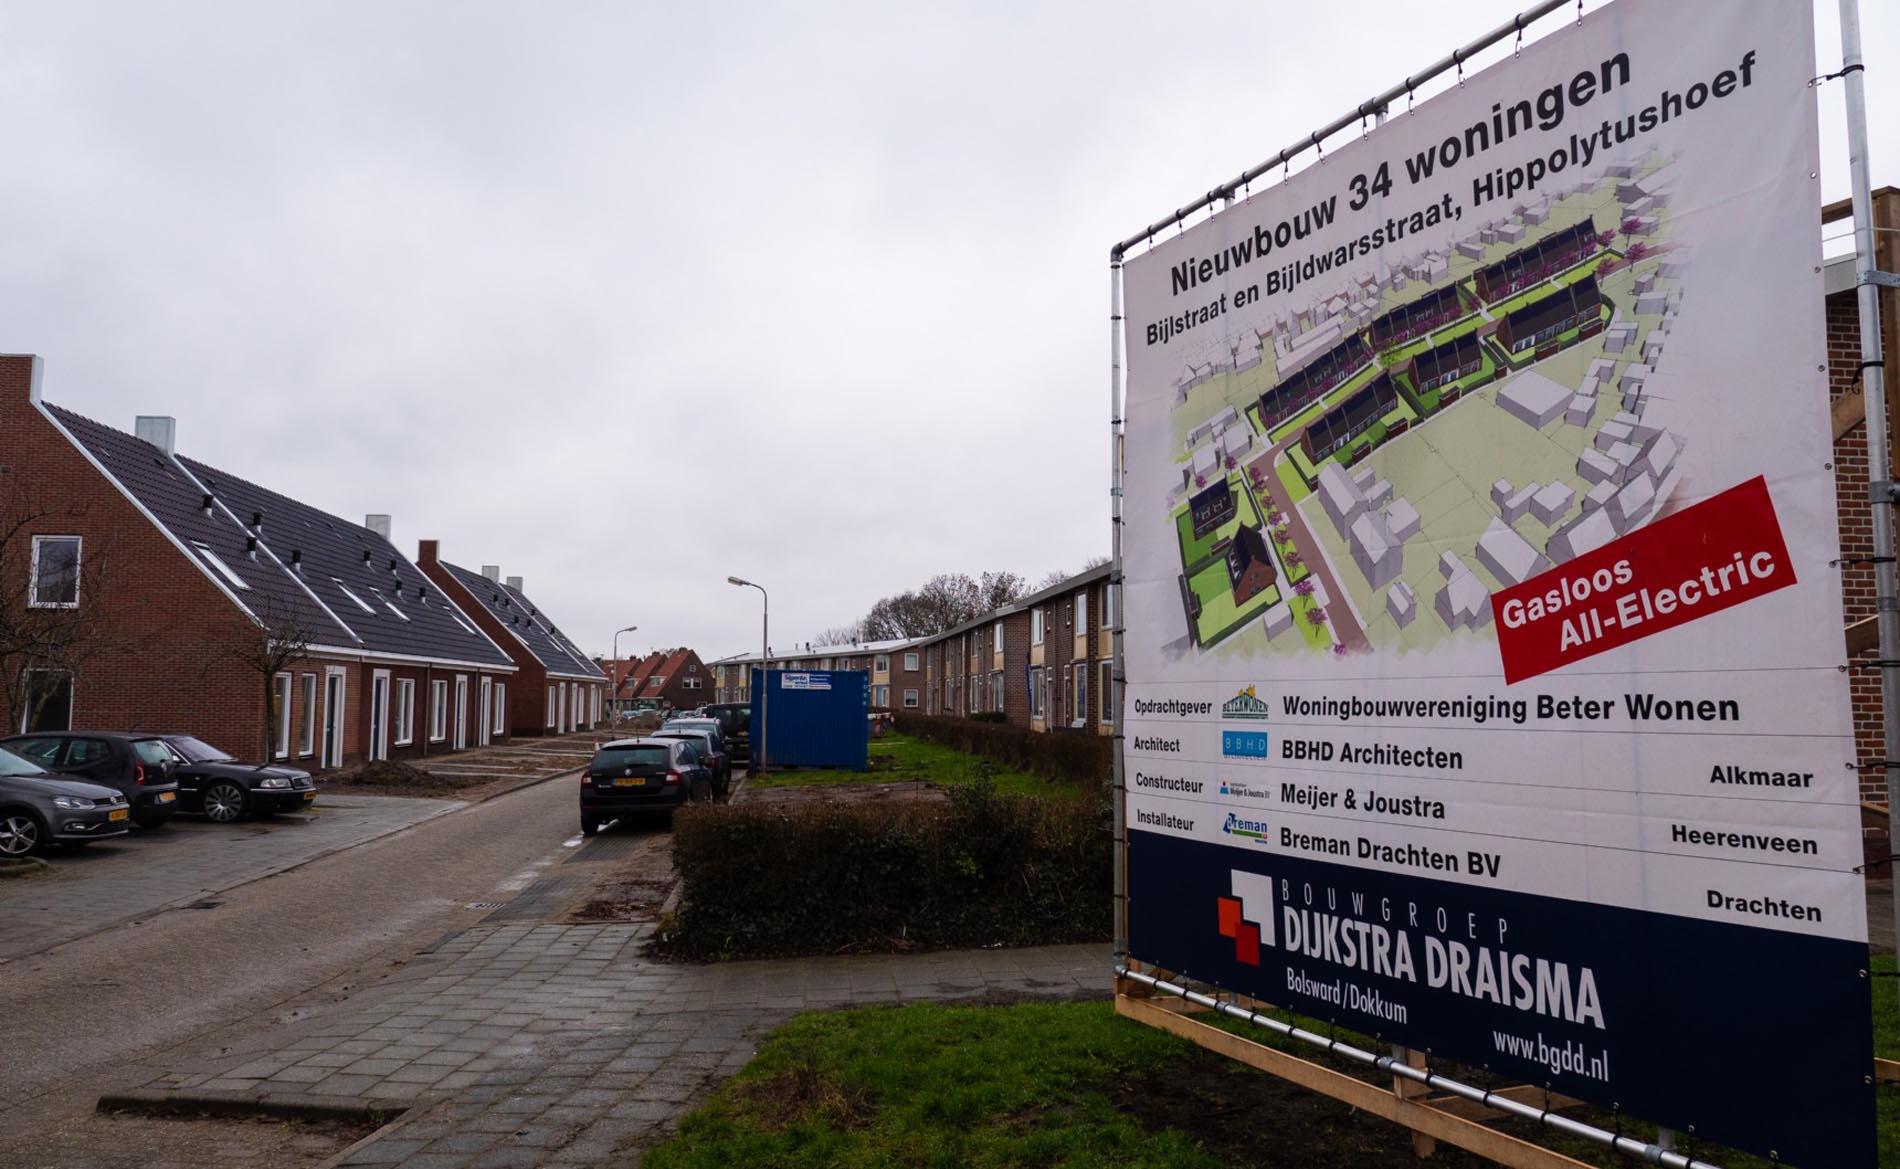 architect woningbouw levensloopbestendig huurwoningen gasloos herstructurering BBHD architecten